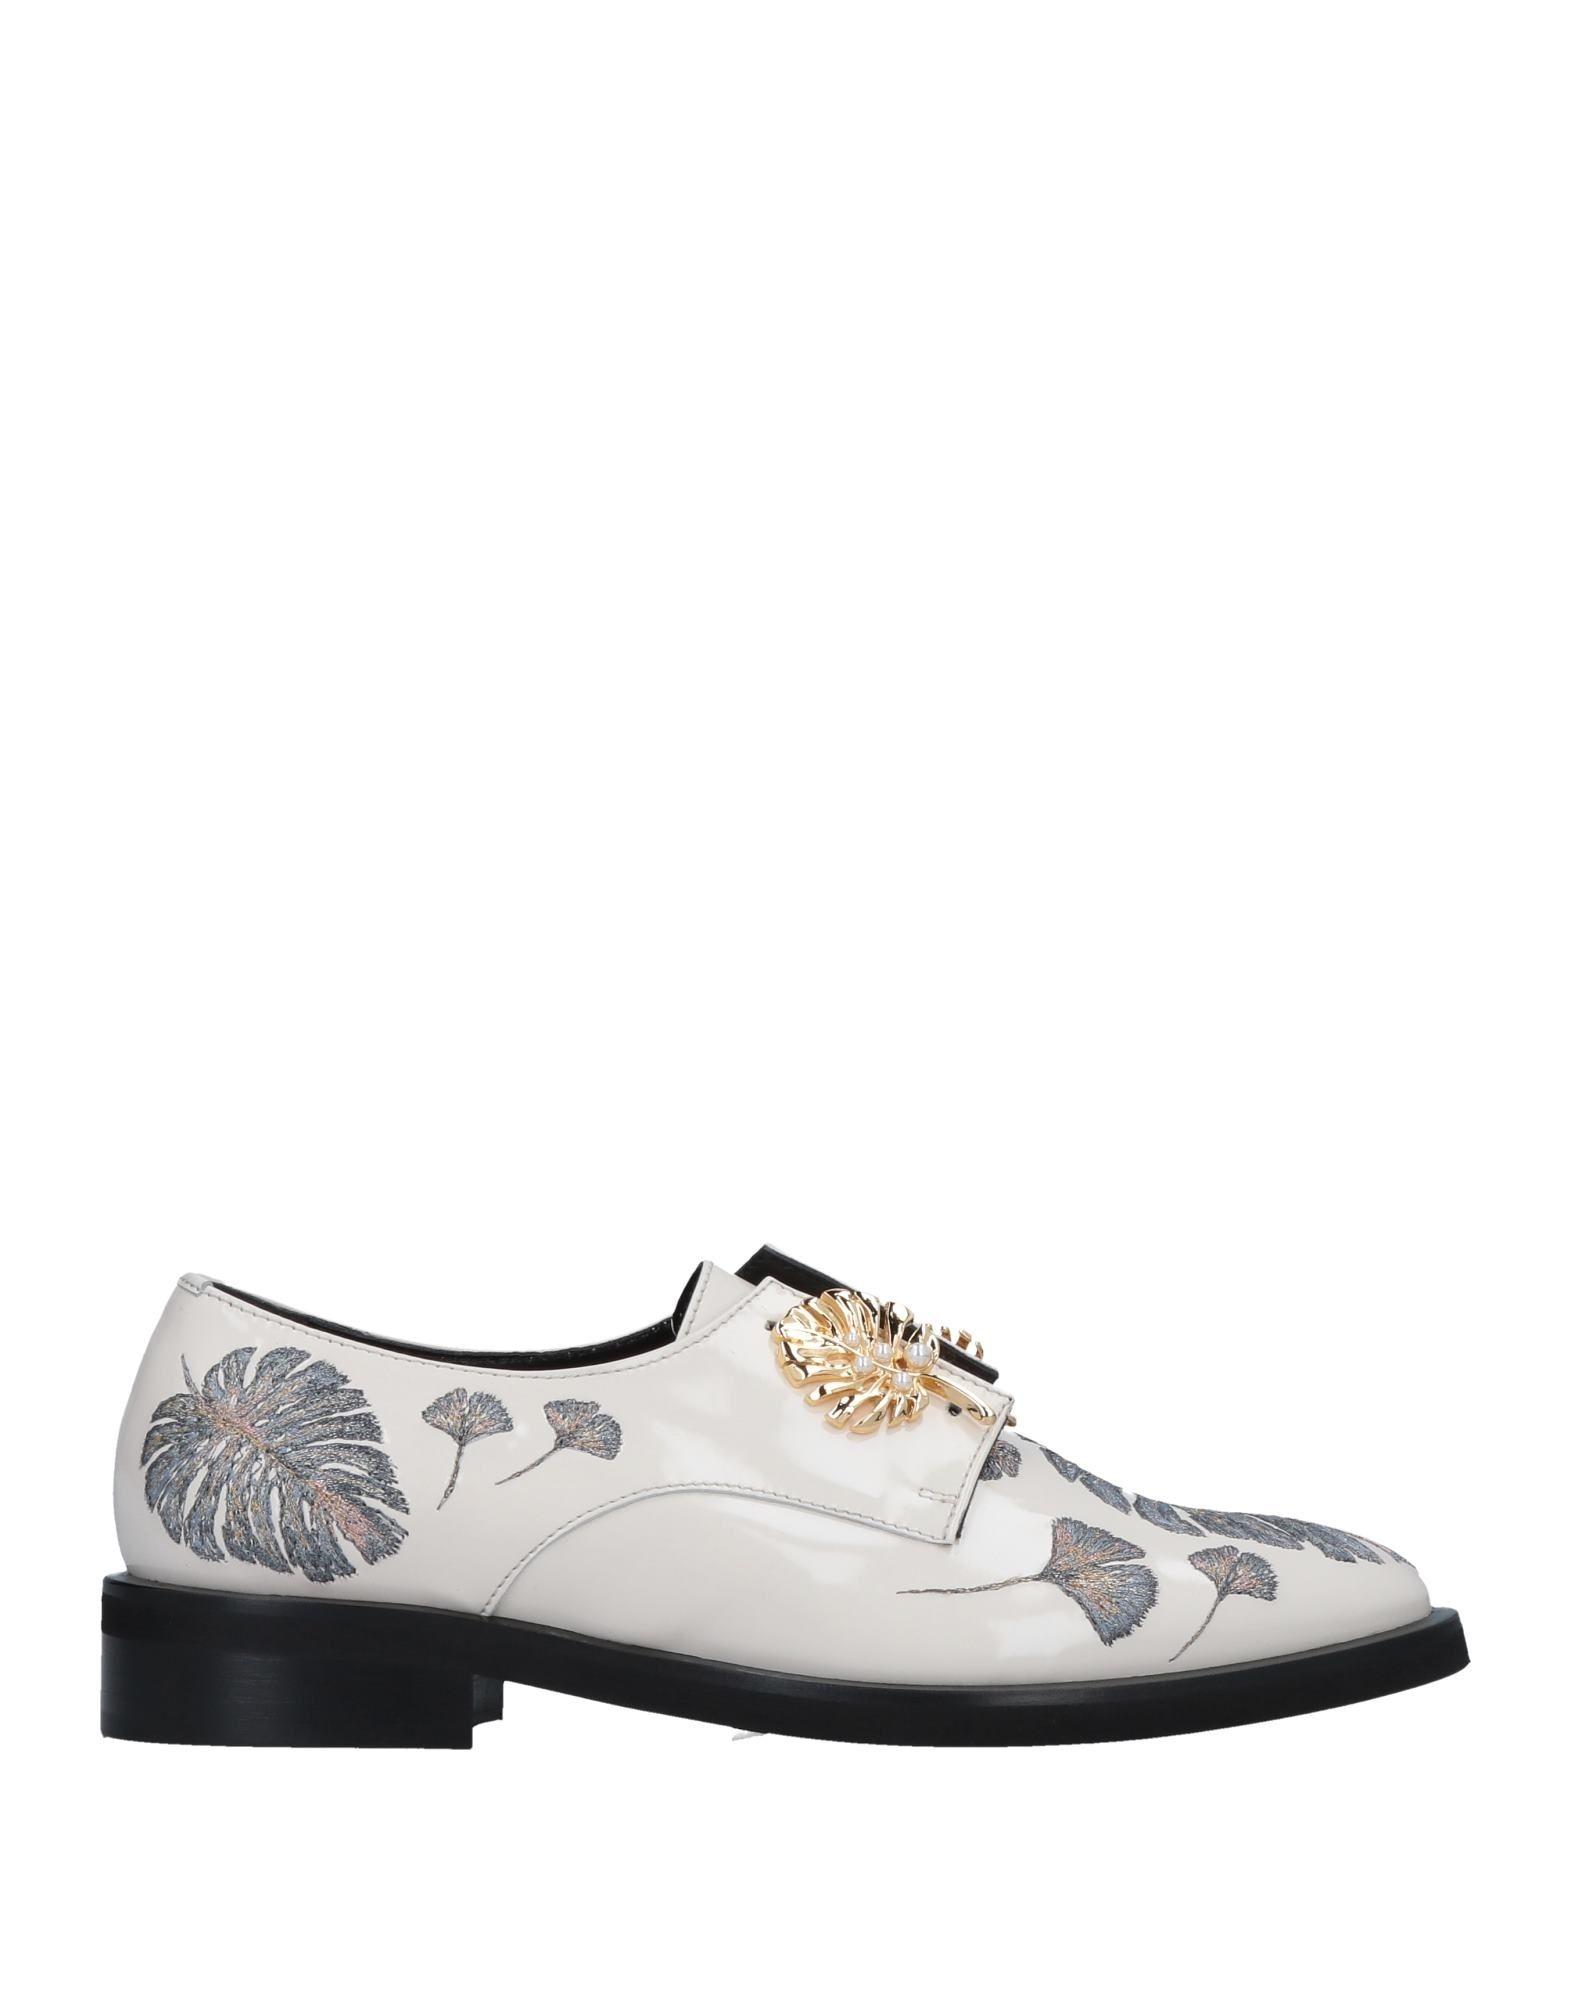 Coliac Martina Grasselli Mokassins Damen Schuhe  11505249QEGünstige gut aussehende Schuhe Damen ebb564